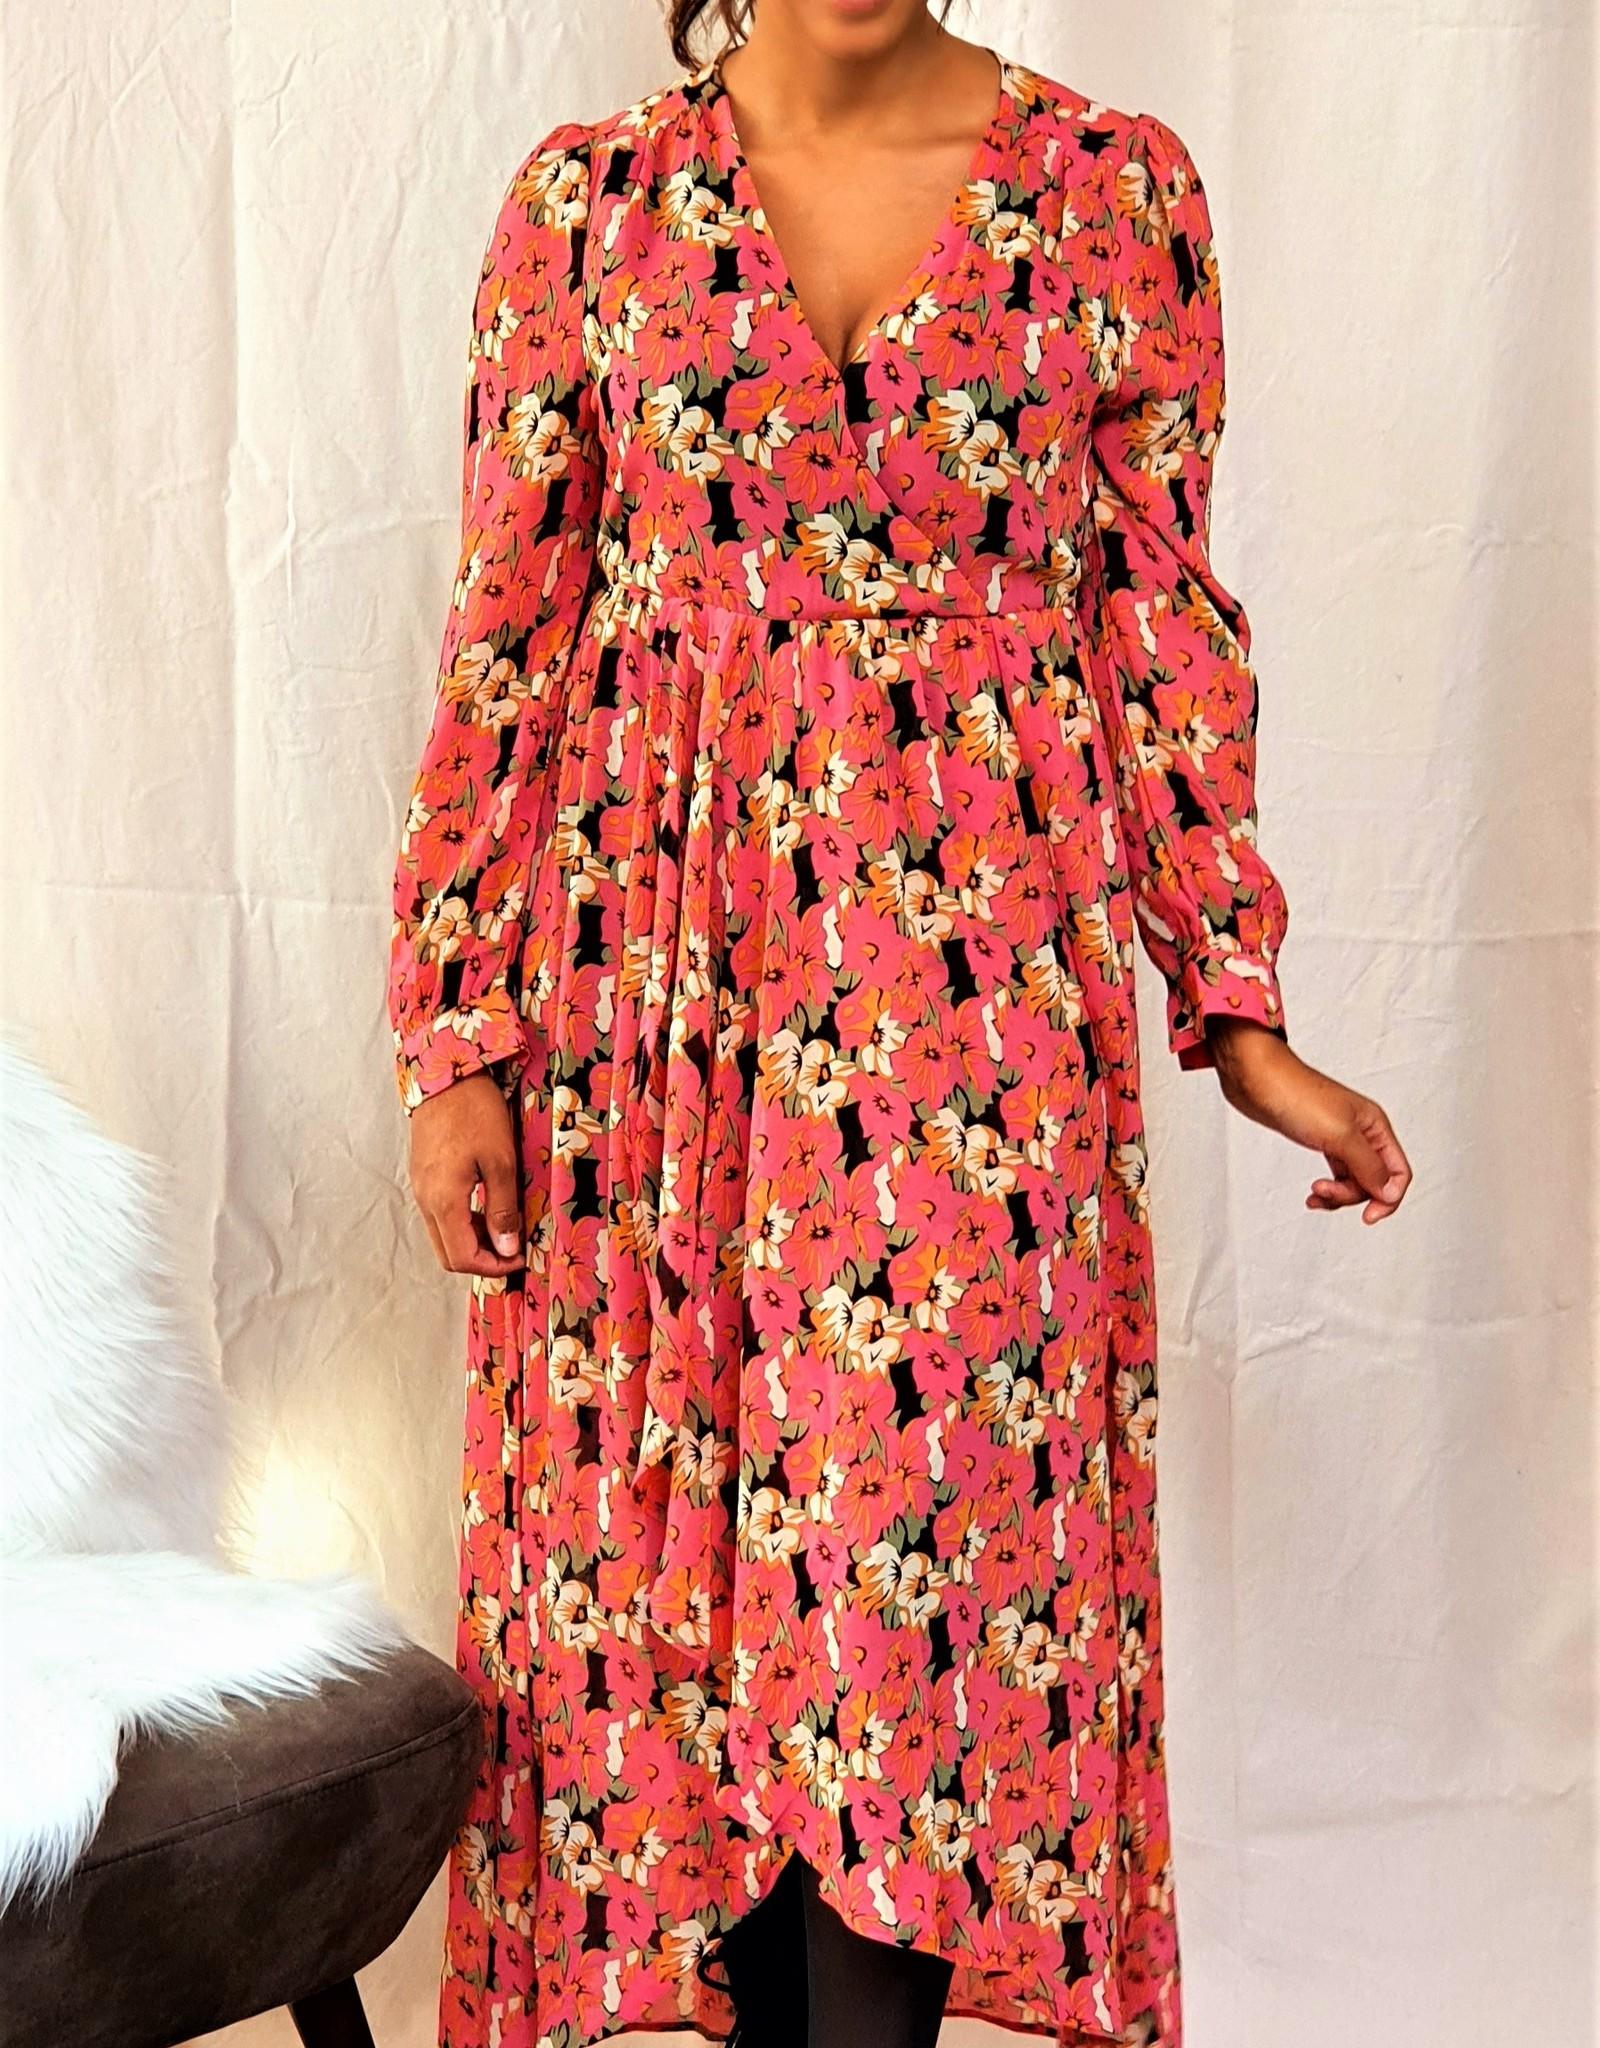 Cherry Paris Officiel Cherry love pink dress